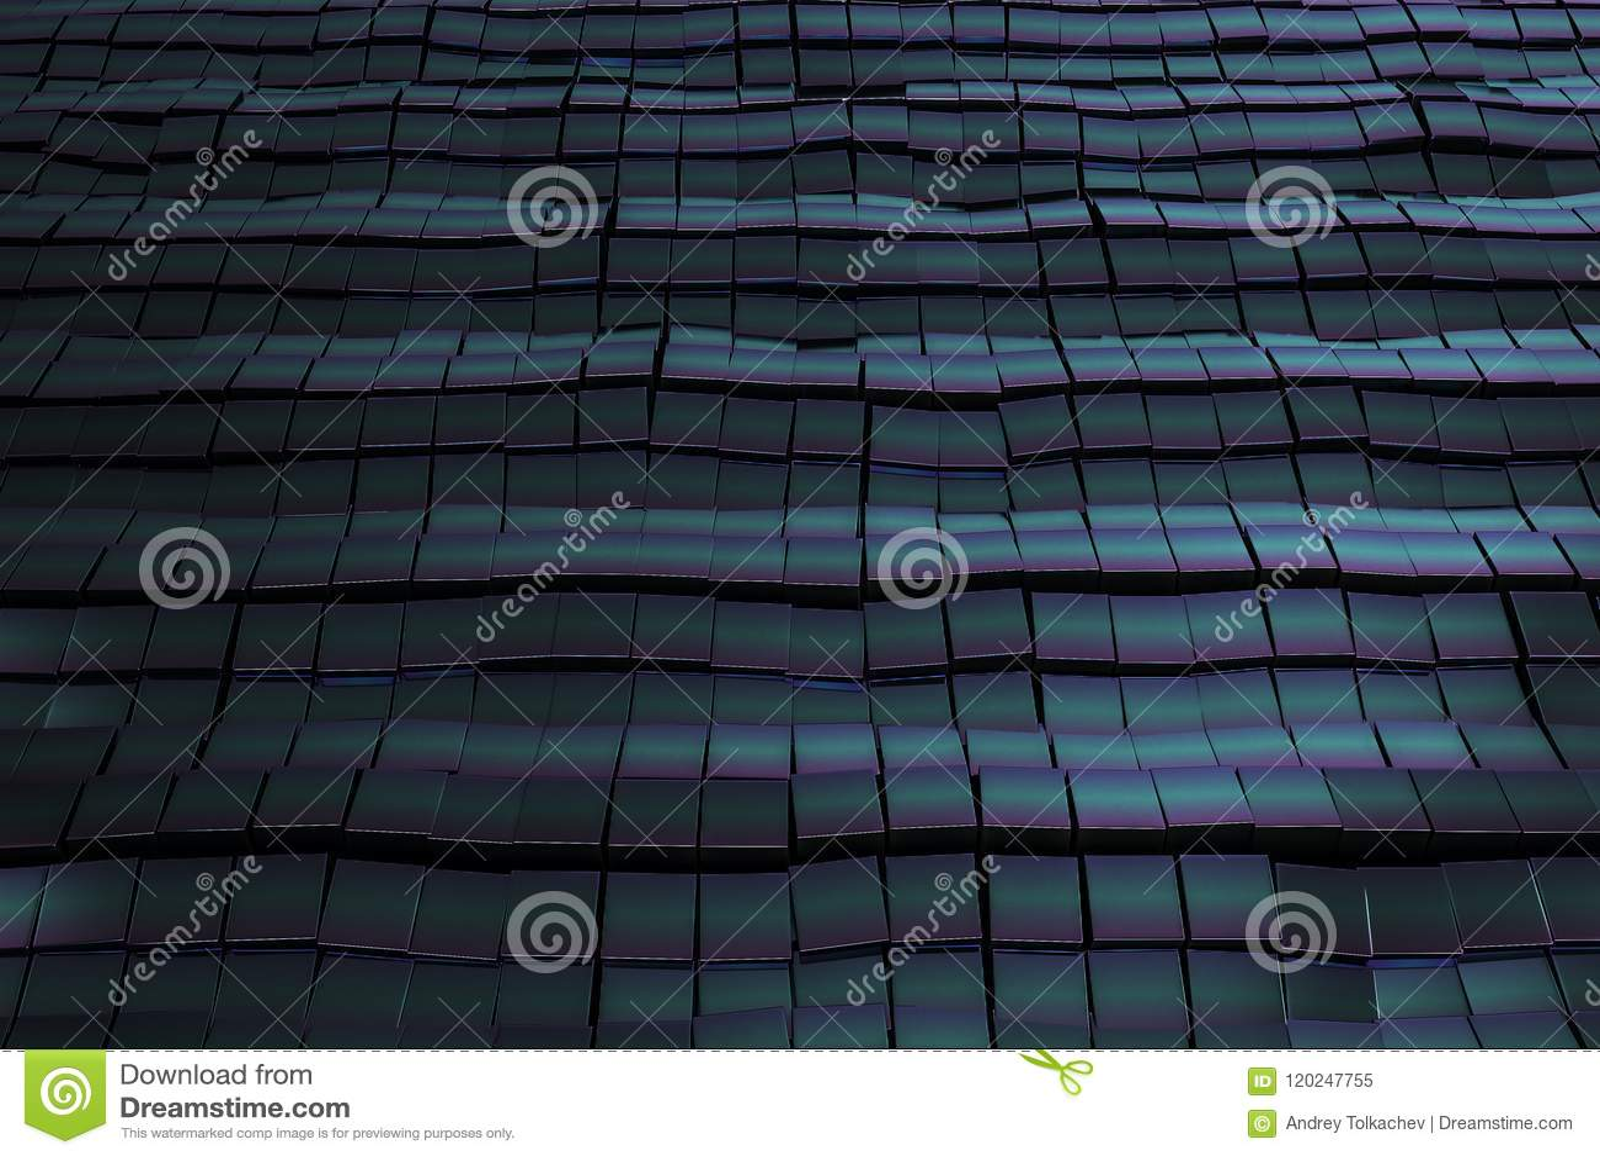 Dark blue and cian metal squares